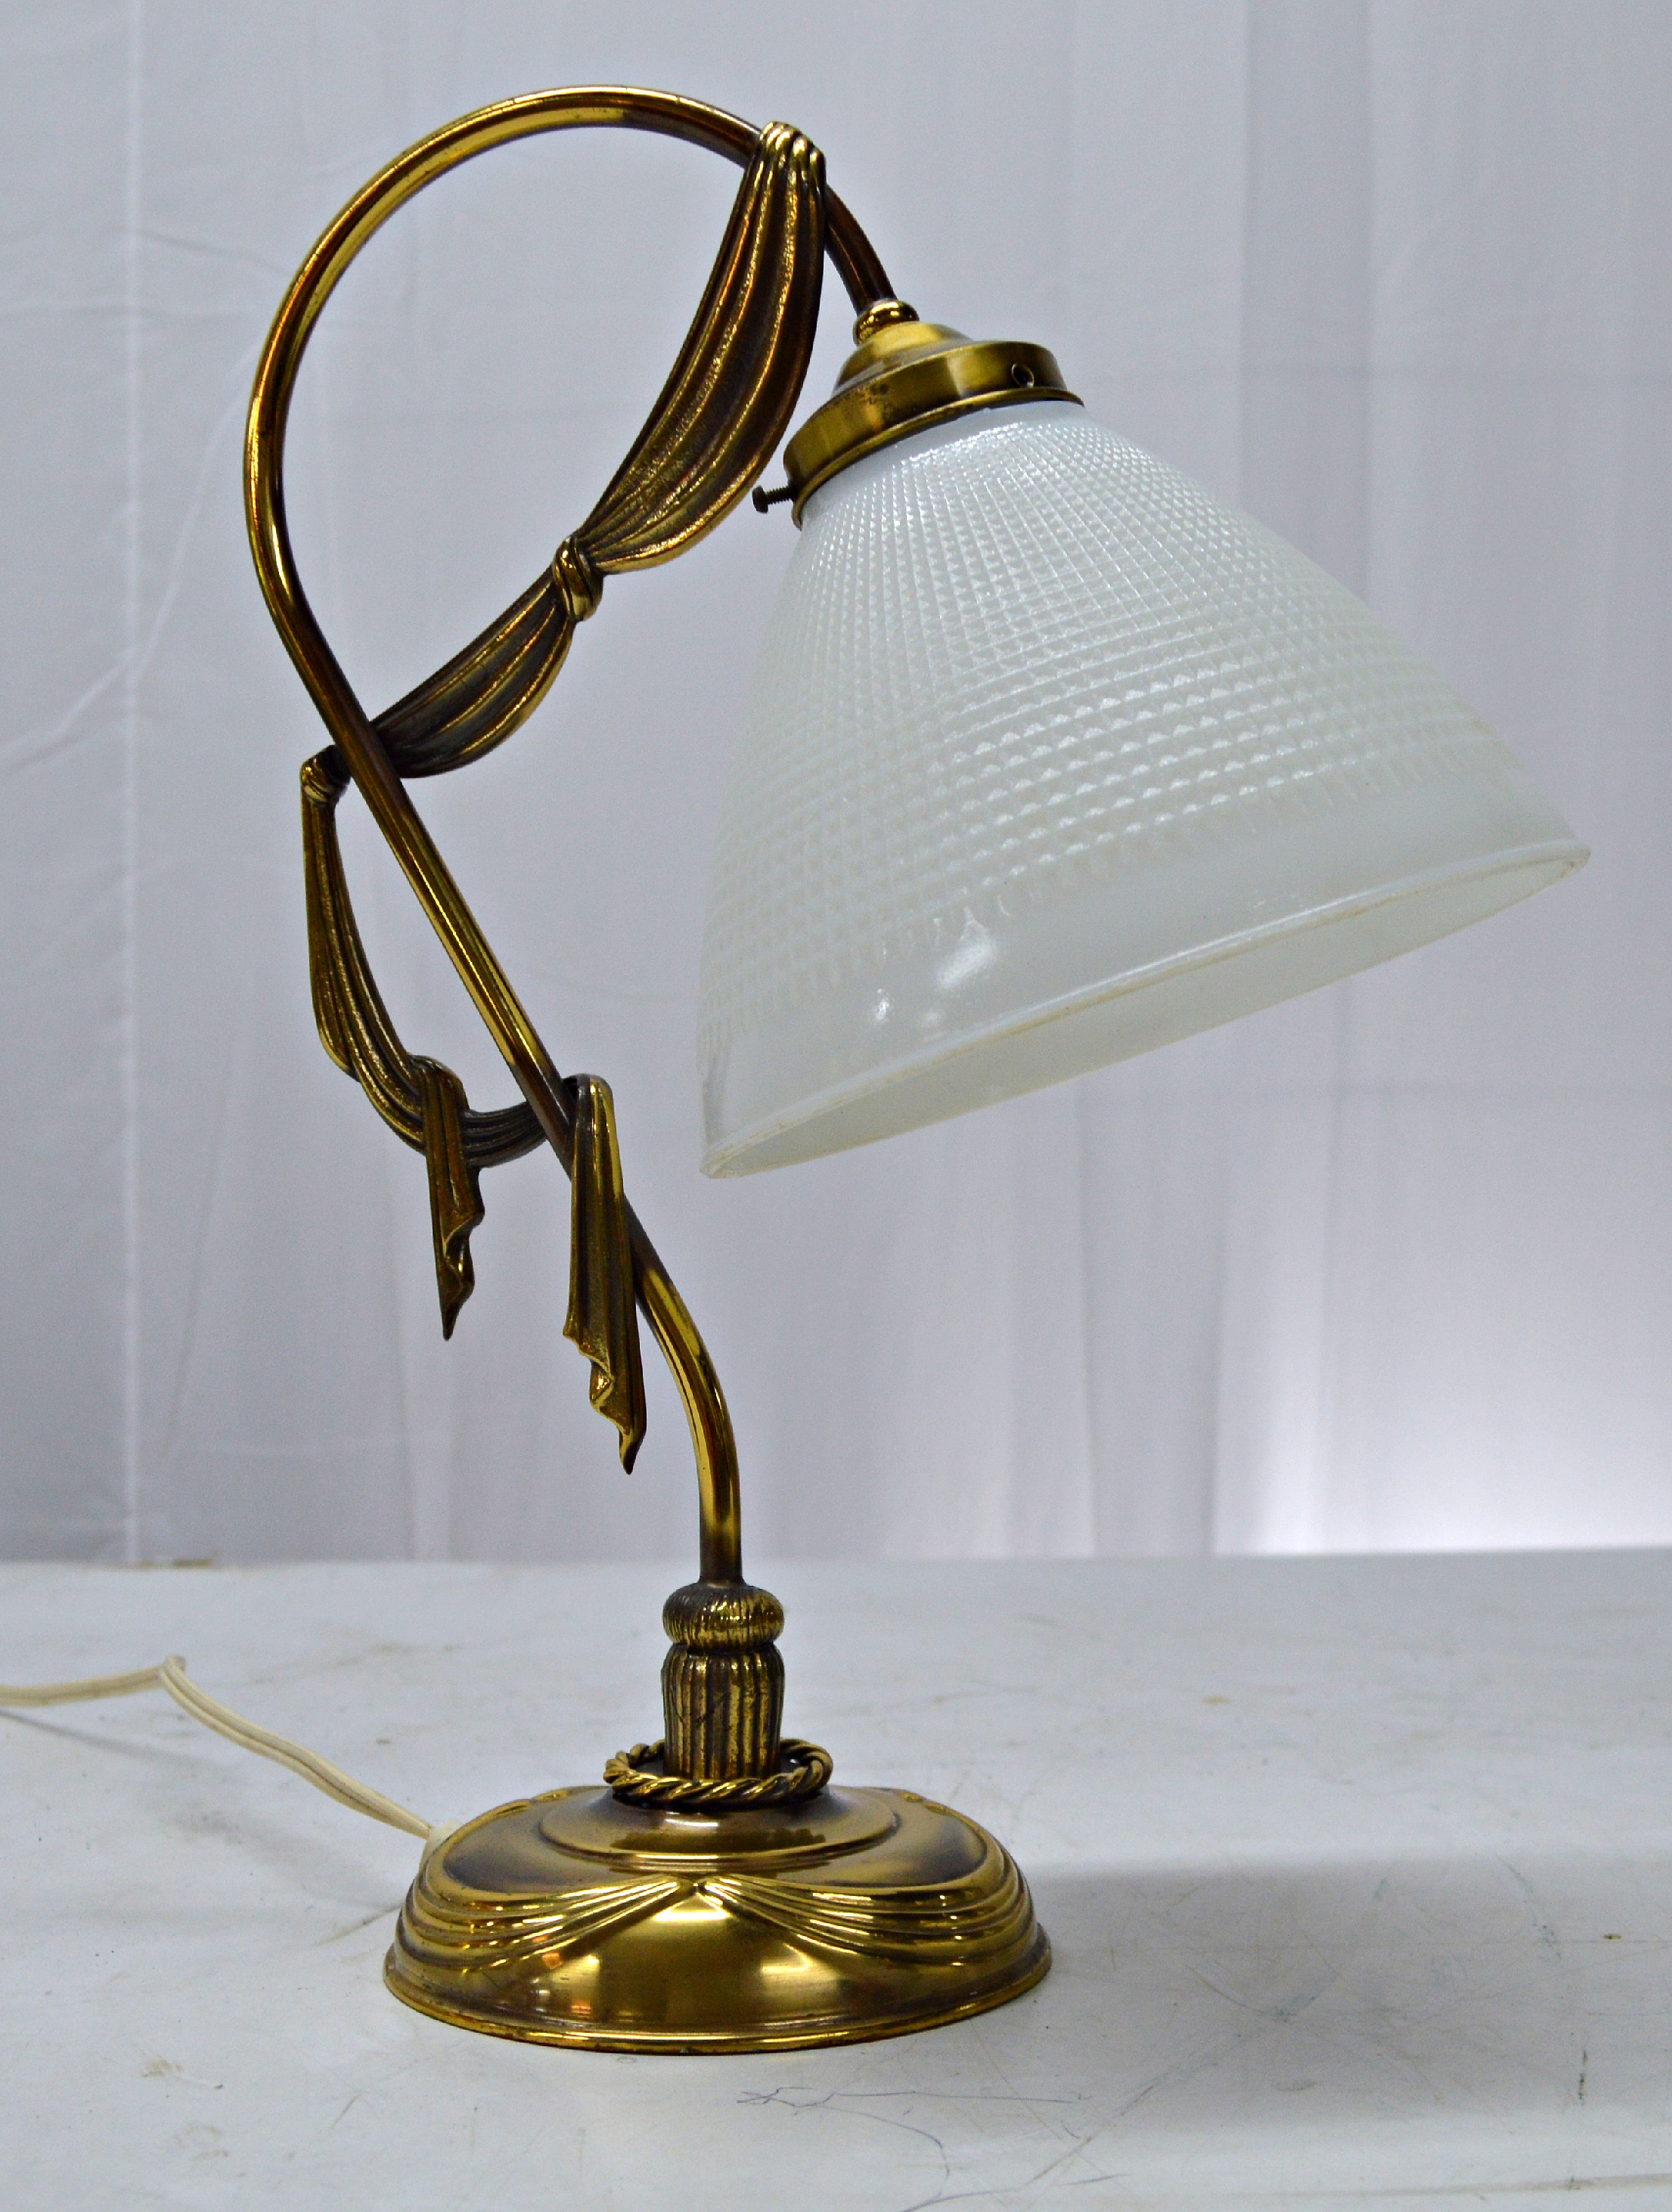 French Art Nouveau Style Desk Lamp Chairish